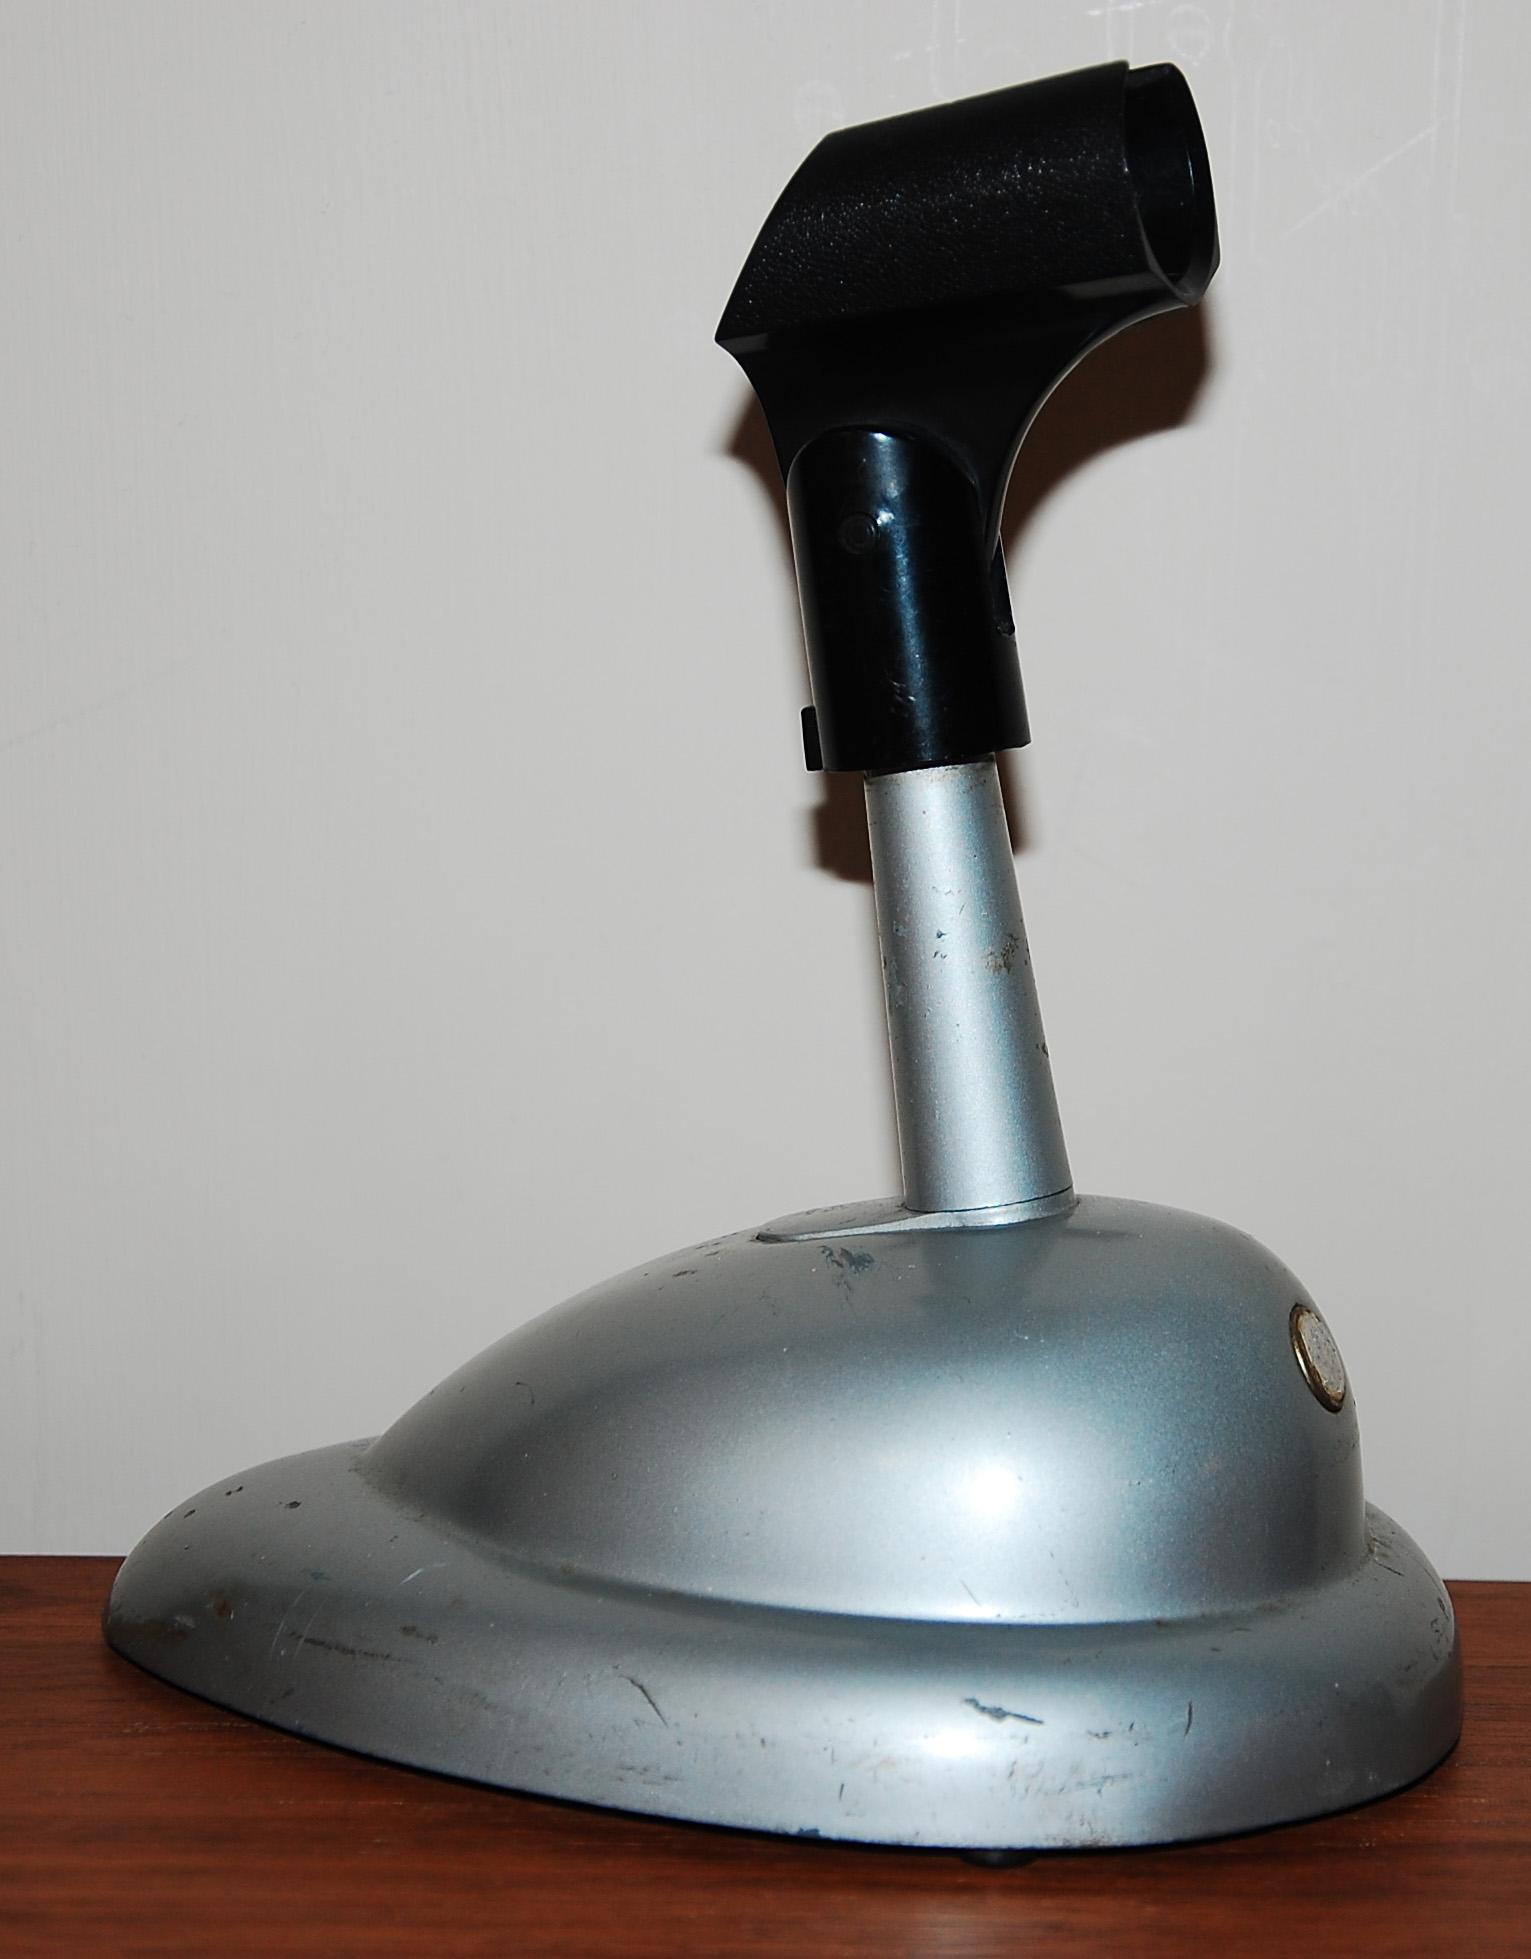 FileShure desktop microphone standjpg Wikimedia Commons